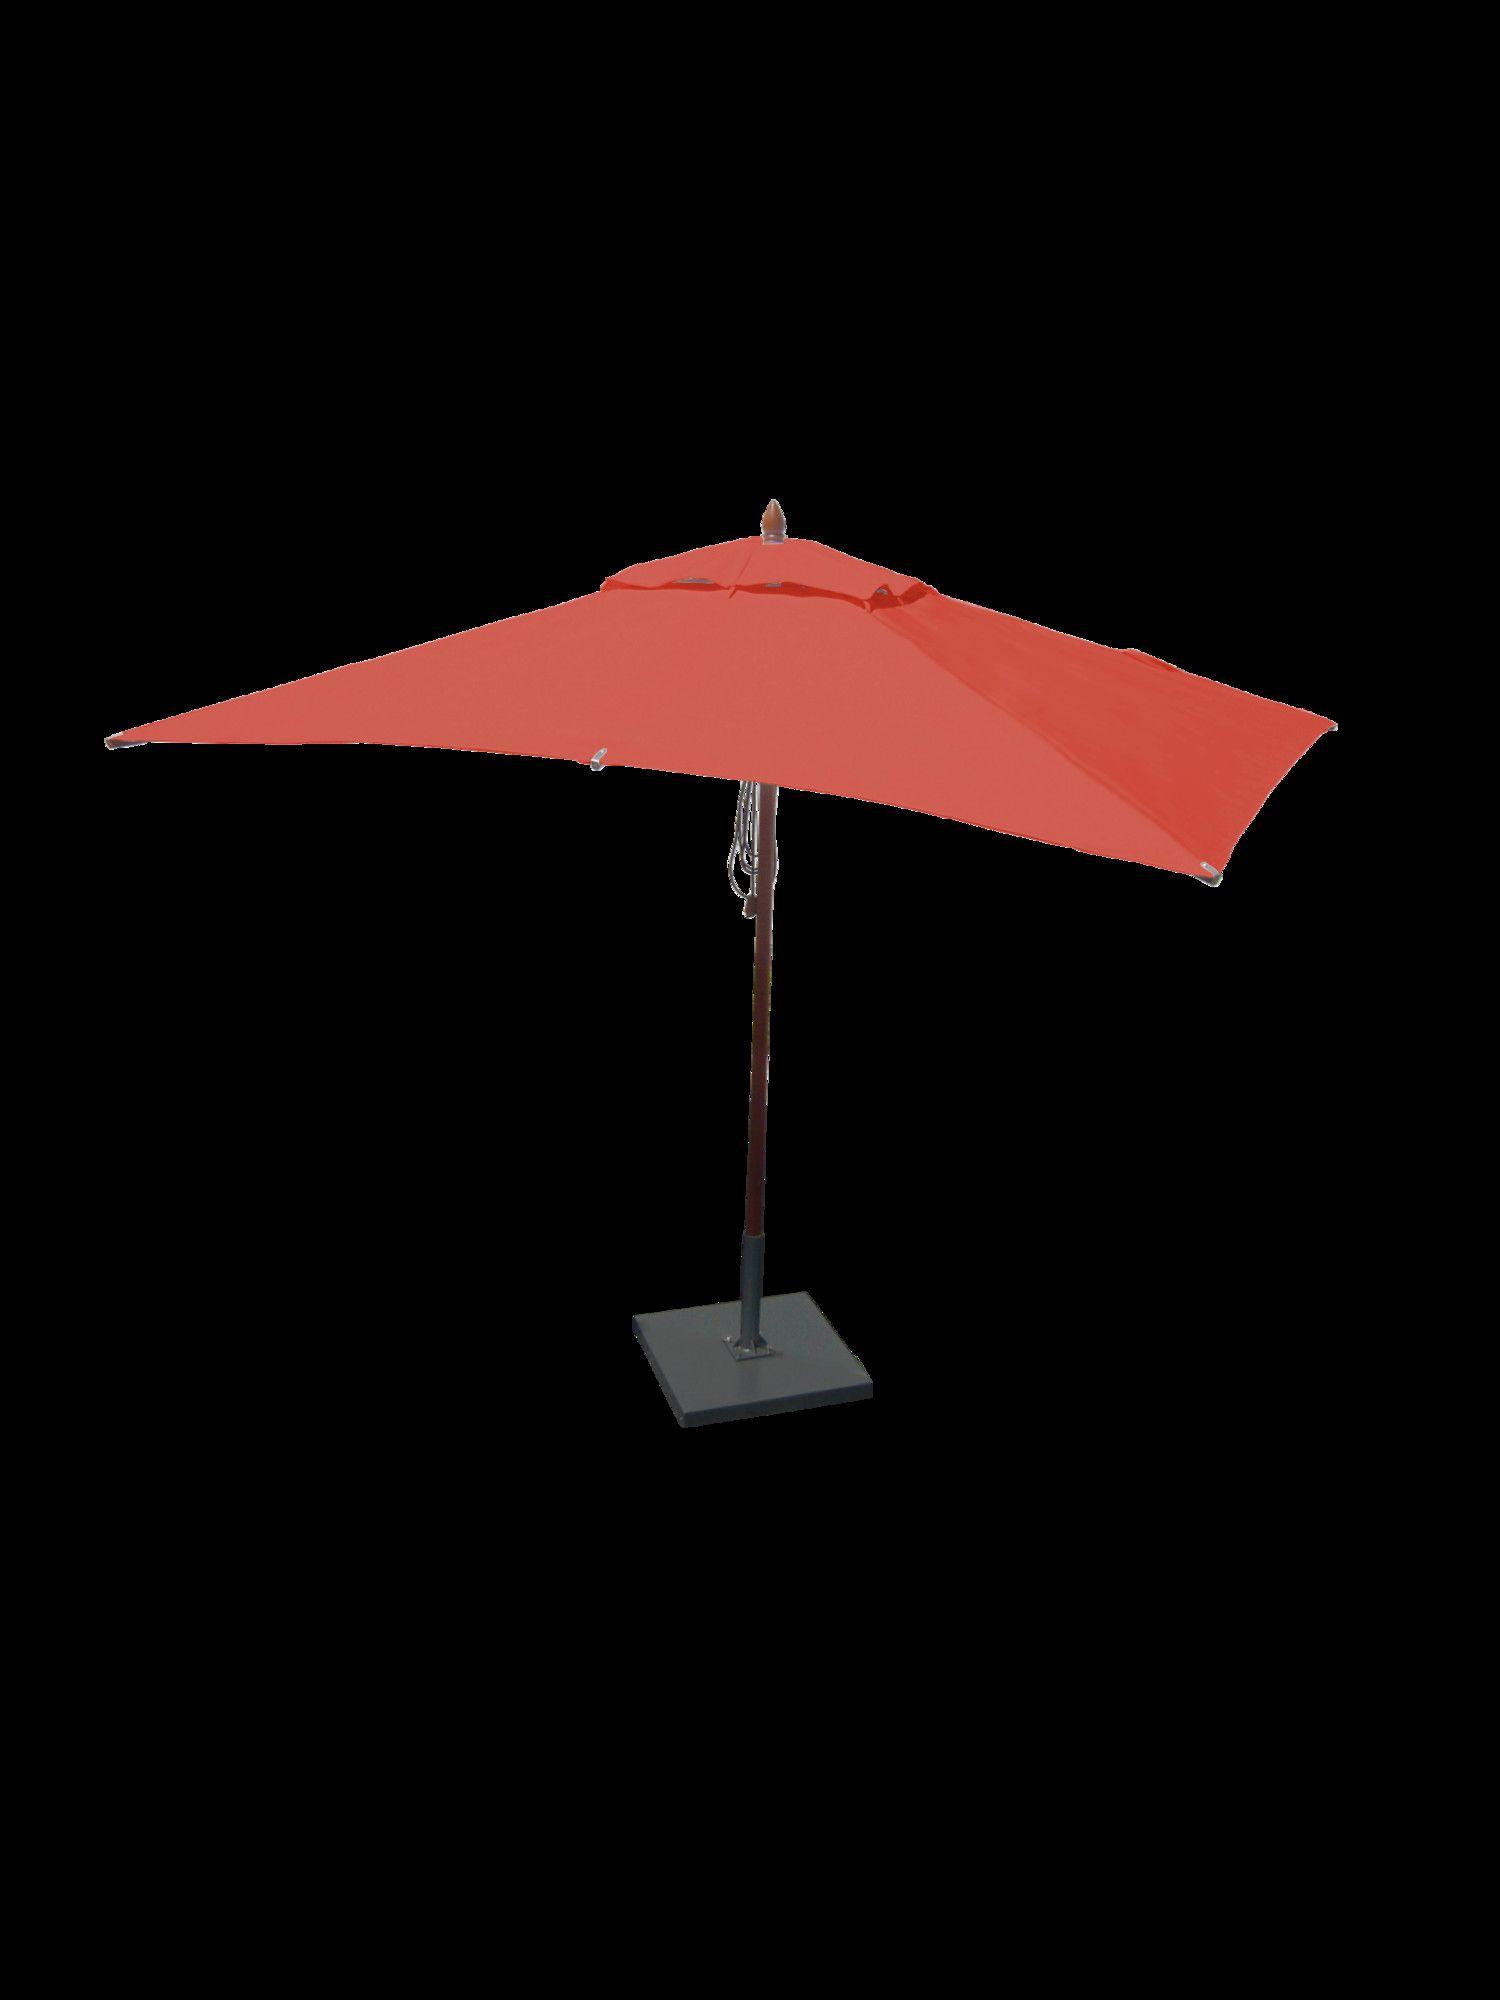 10' x 6.5' Rectangular Market Umbrella